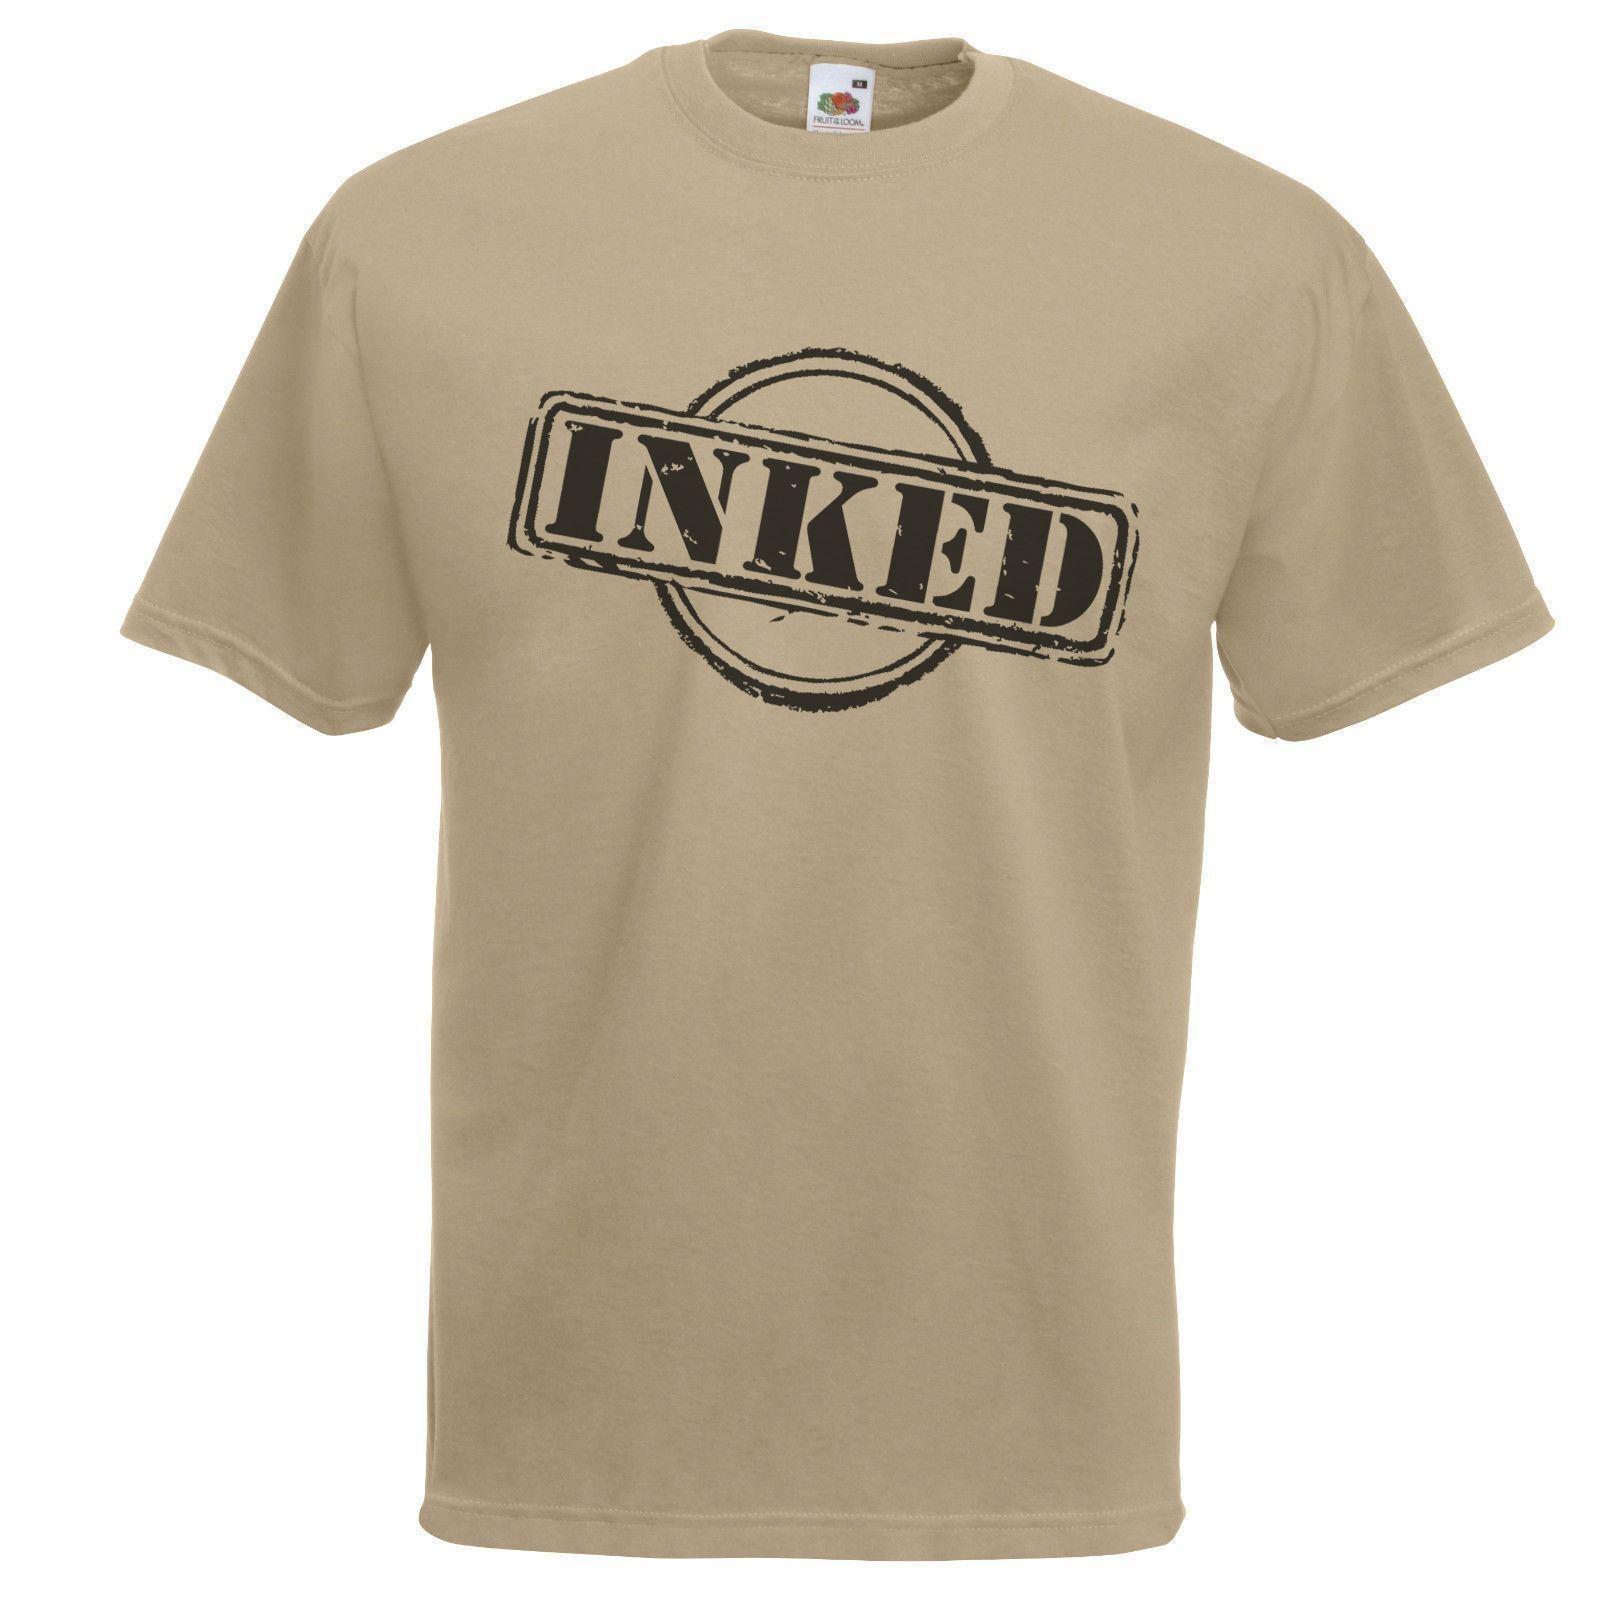 Best Printed T Shirts Uk | Saddha